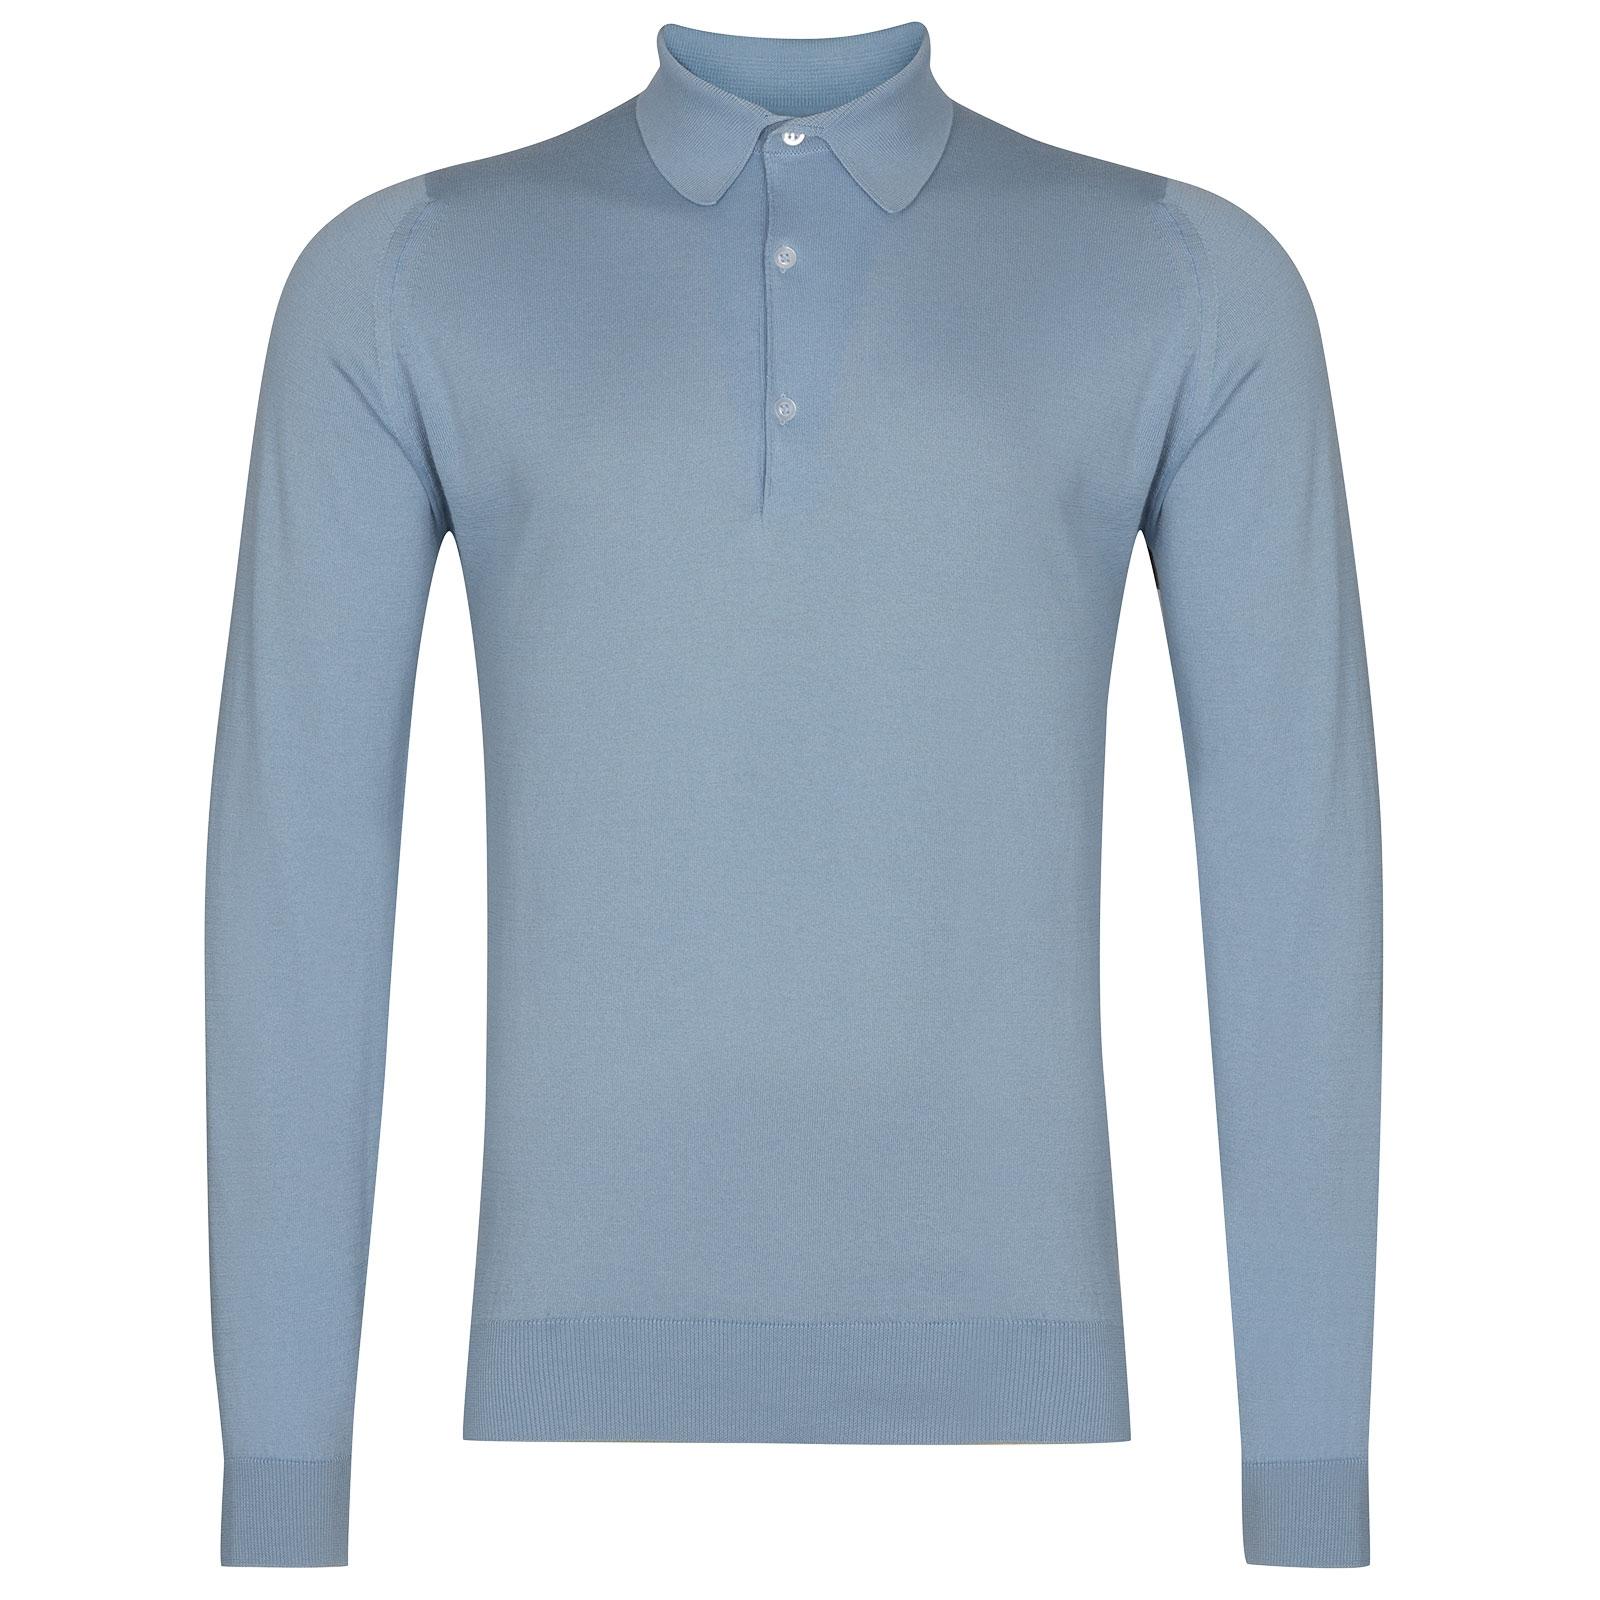 John Smedley Bradwell in Dusk Blue Shirt-XLG